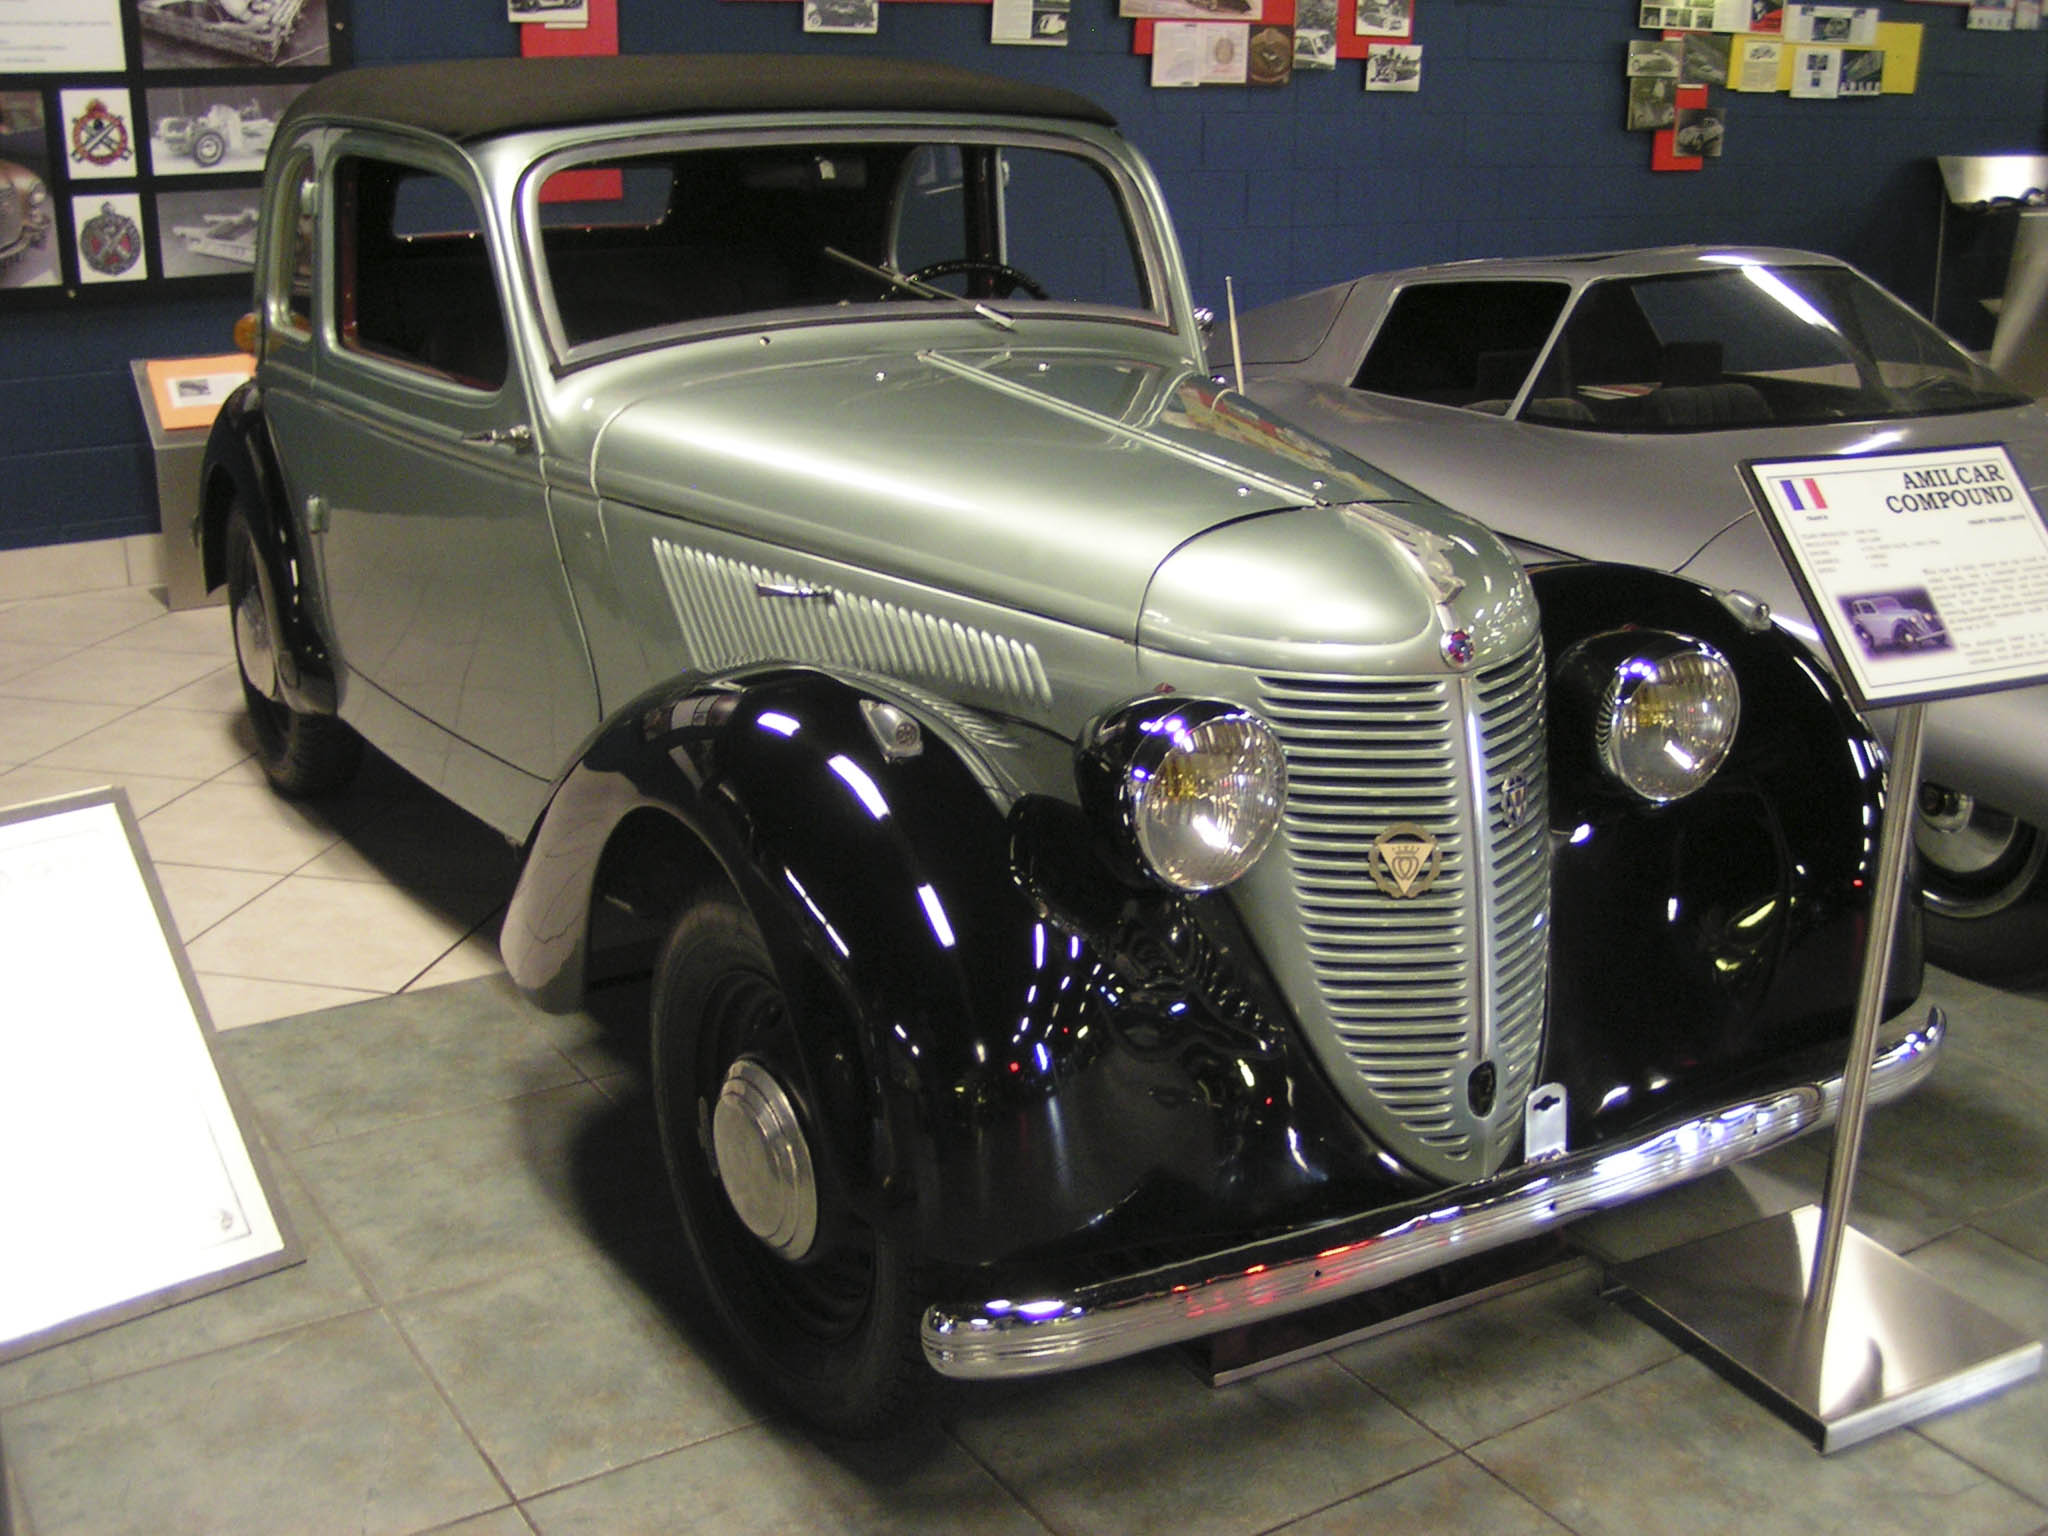 1961 ford thunderbird restored car the cars. Black Bedroom Furniture Sets. Home Design Ideas